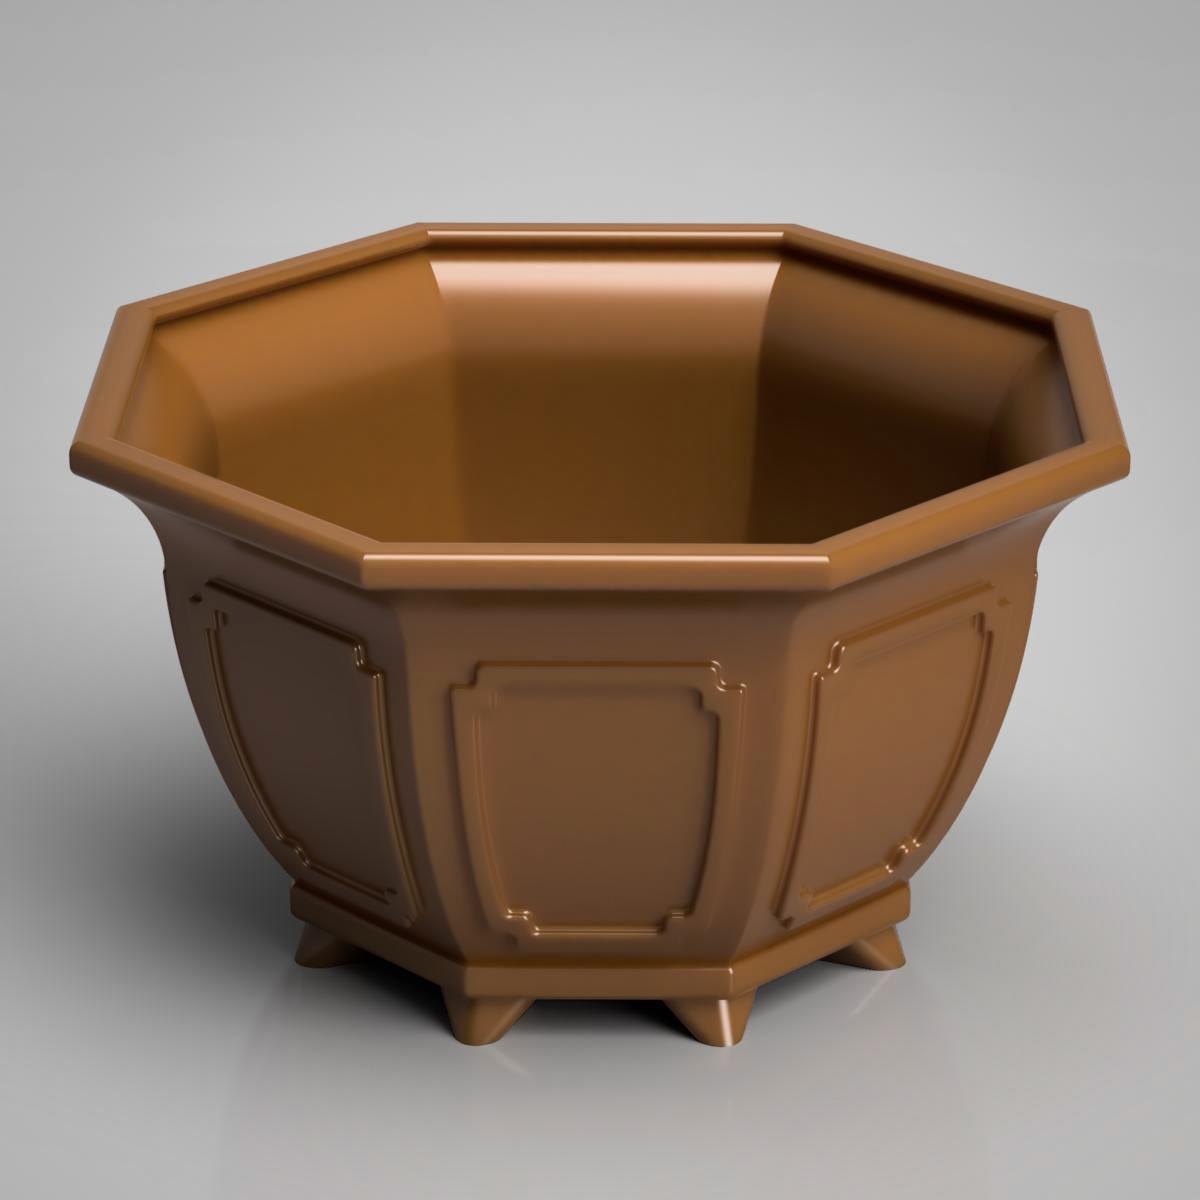 Download Stl File Bonsai Pot Cascade Polygon Style 3d Model 3d Printable Design Cults